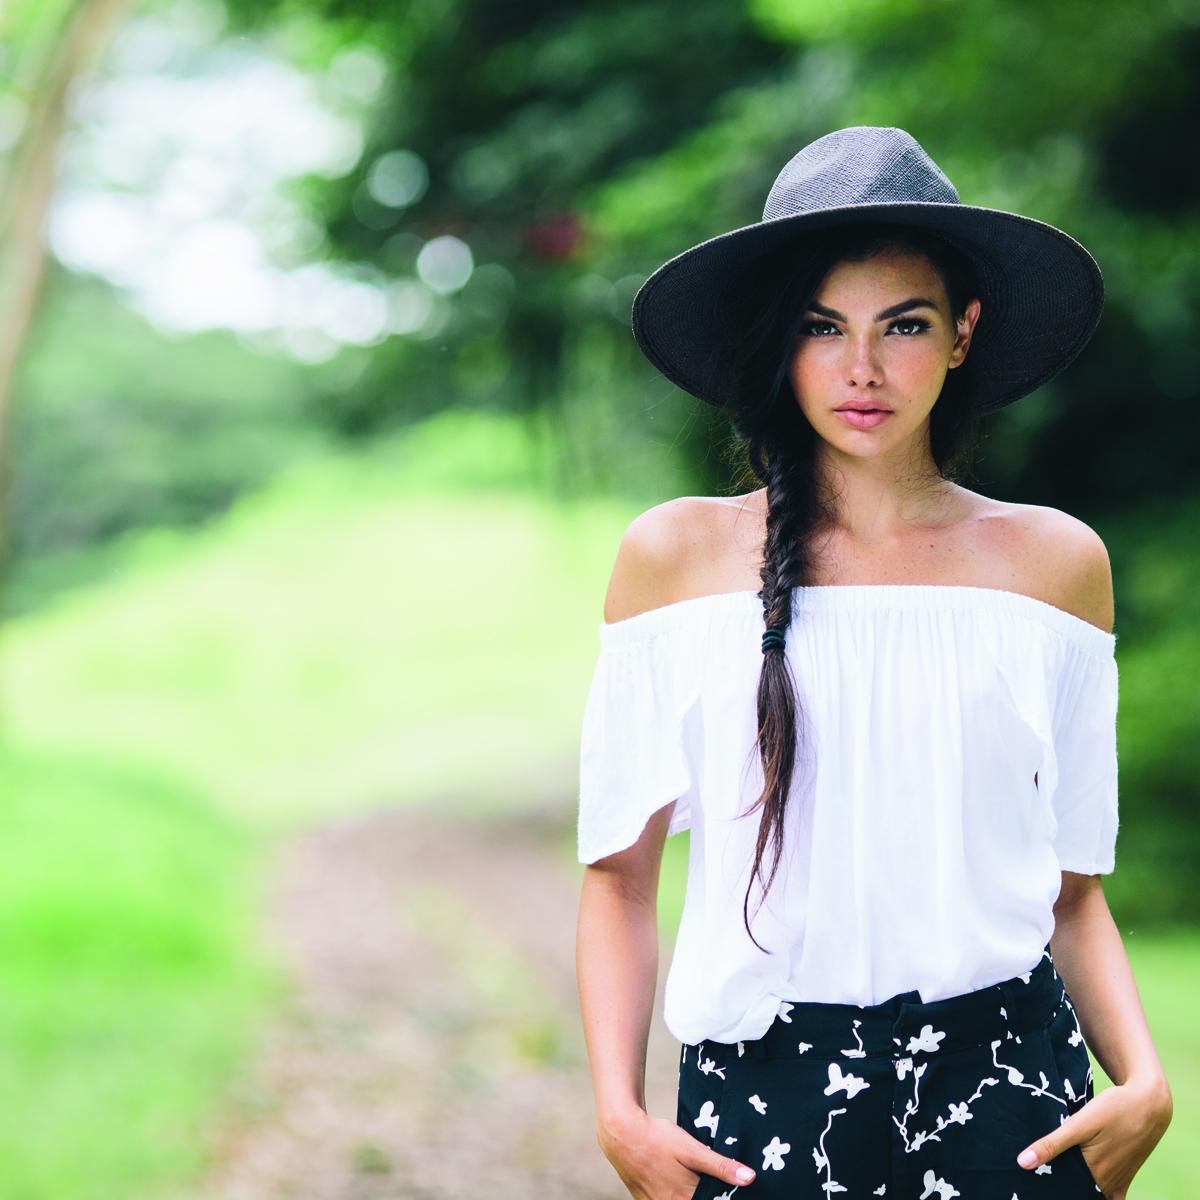 Nikki-Jennifer-Photography-Hawaii-Fashion-Ava-Sky-Fighting-Eel-2.jpg